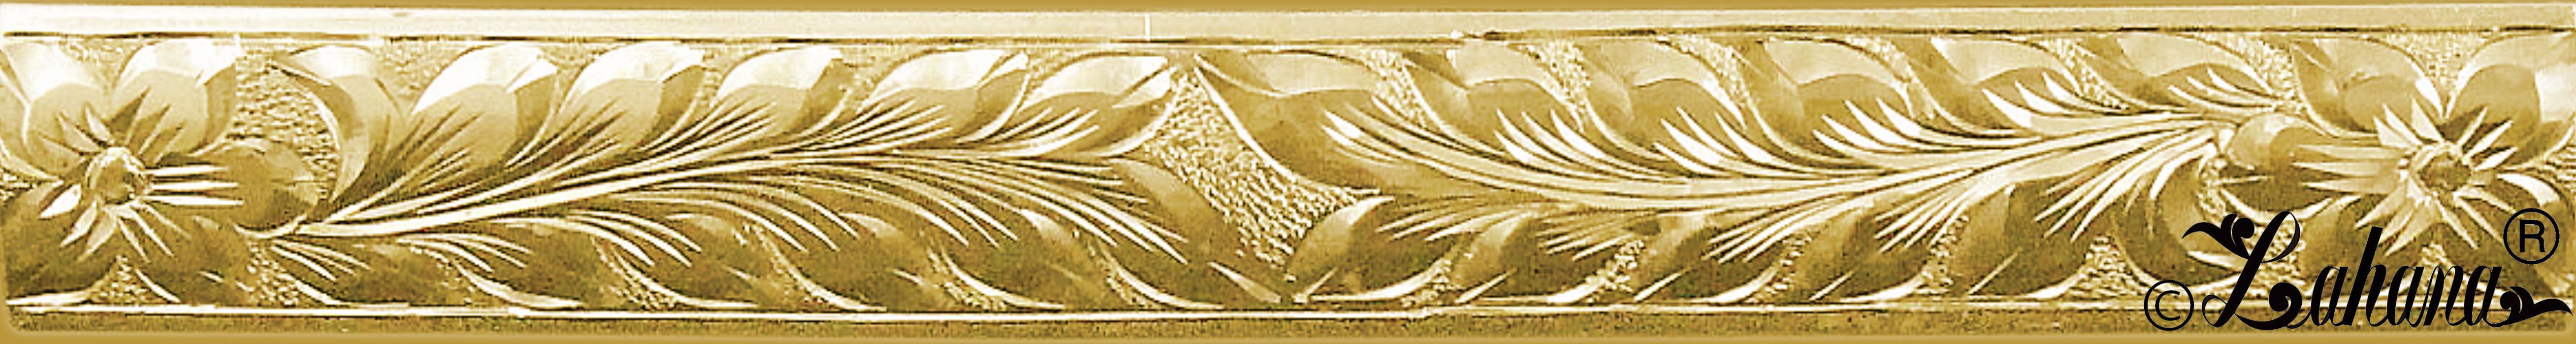 sample-logo-14k-td-j.jpg